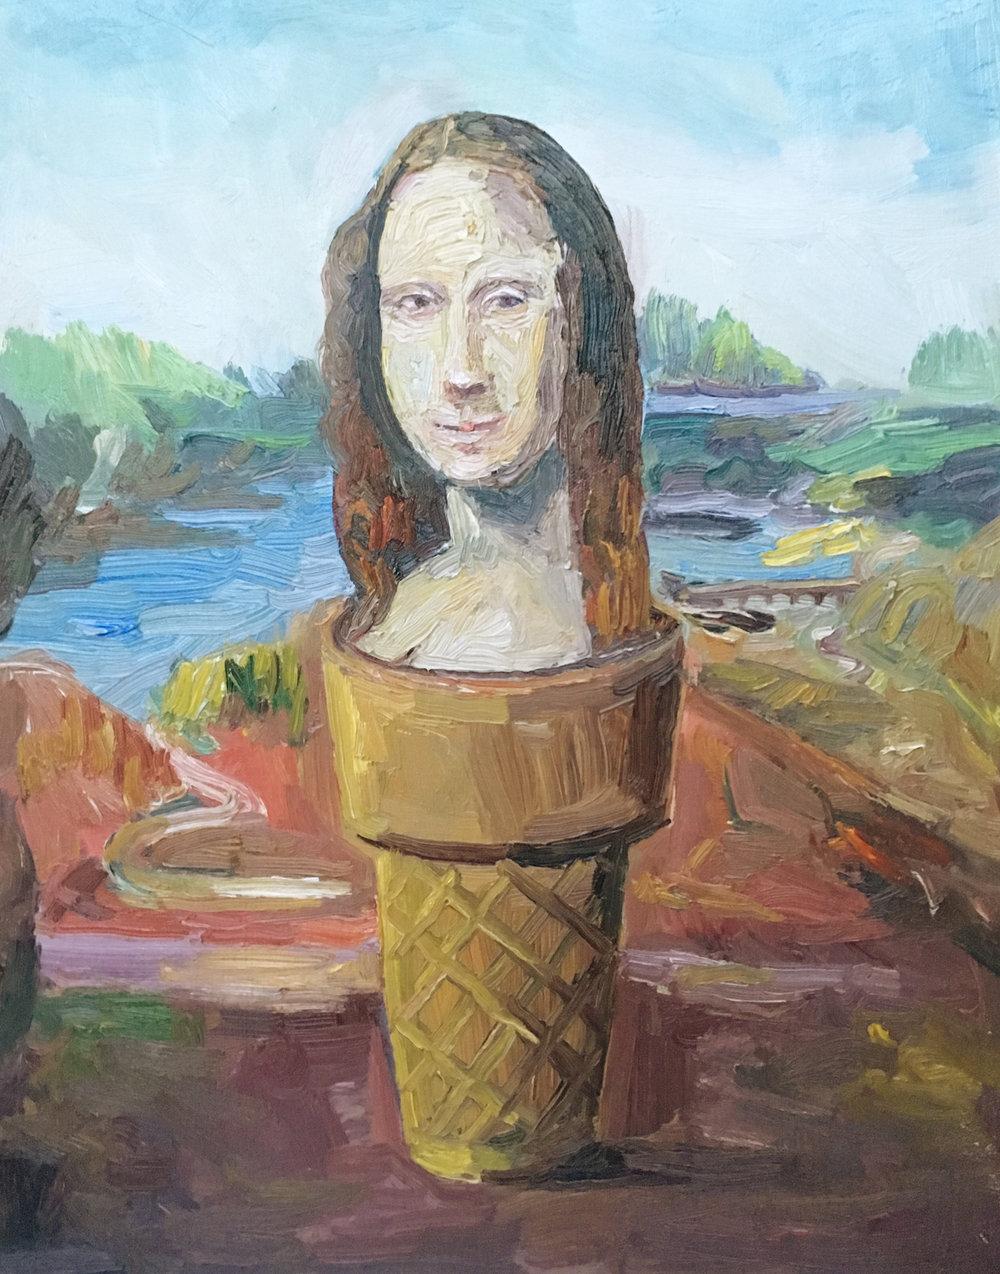 Mona Lisa Ice Cream 16x20in.jpg